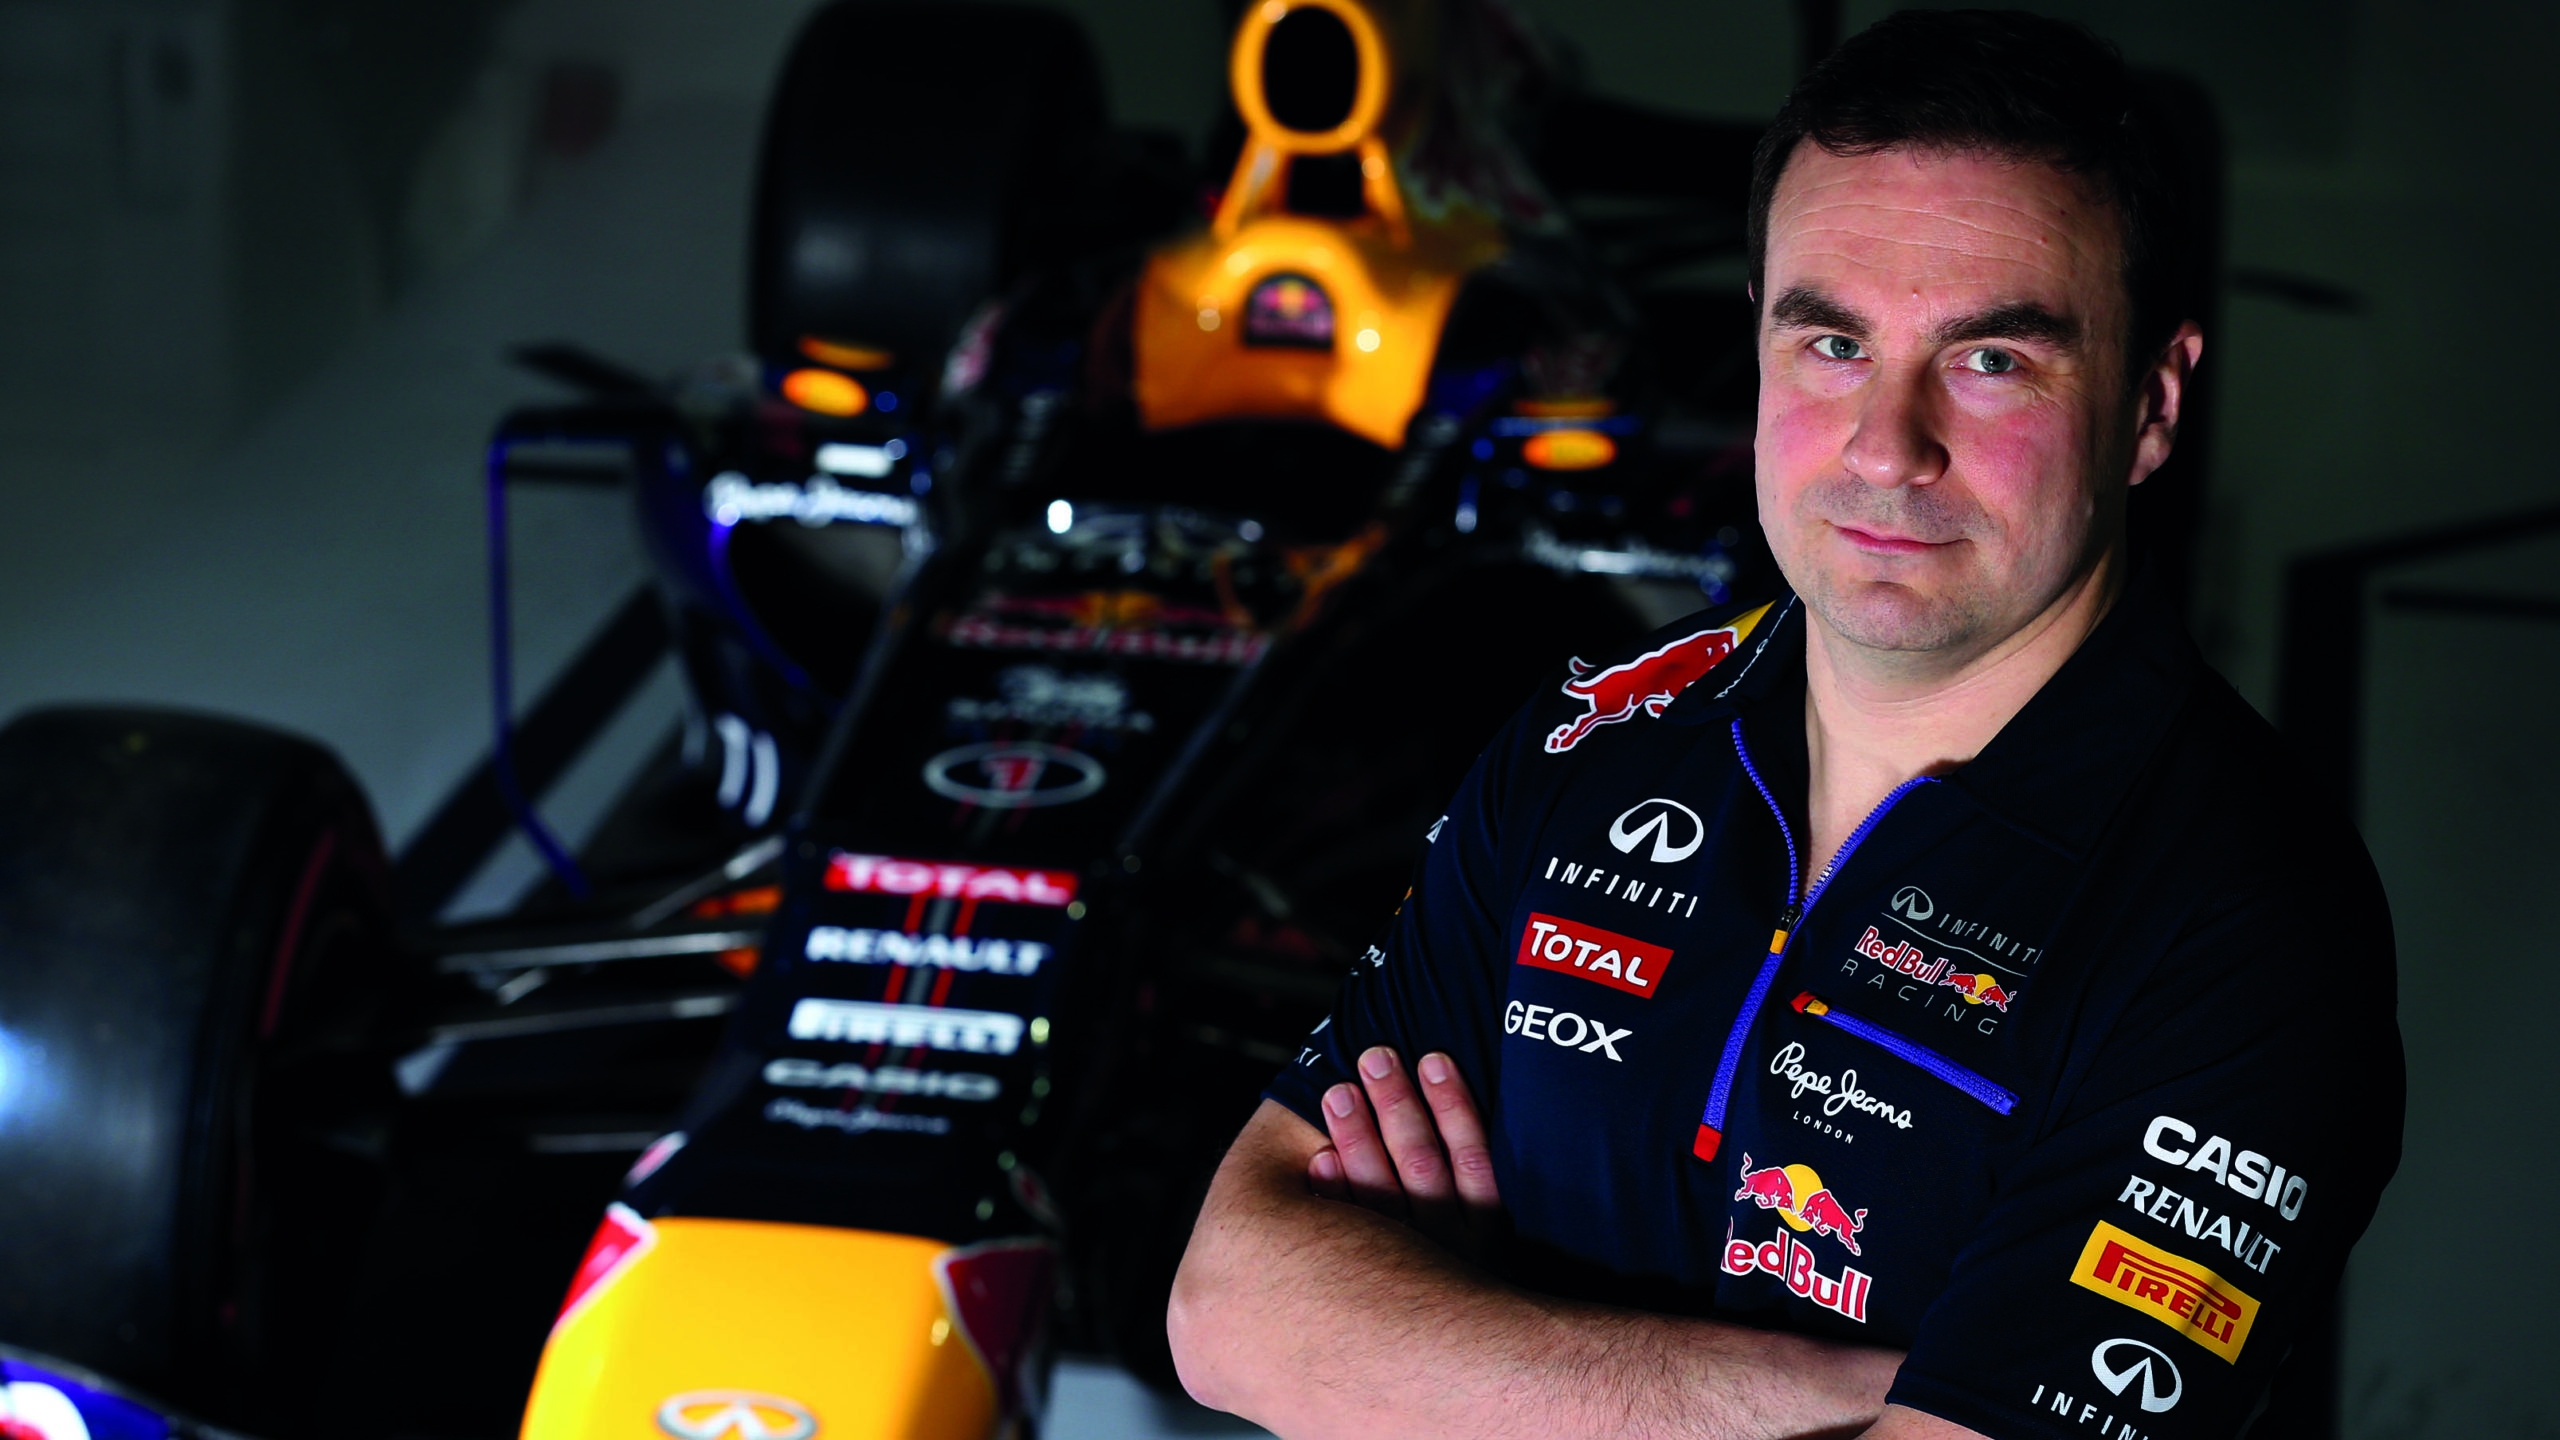 Dan-Fallows-Head-of-Aero-at-Red-Bull-until-2021